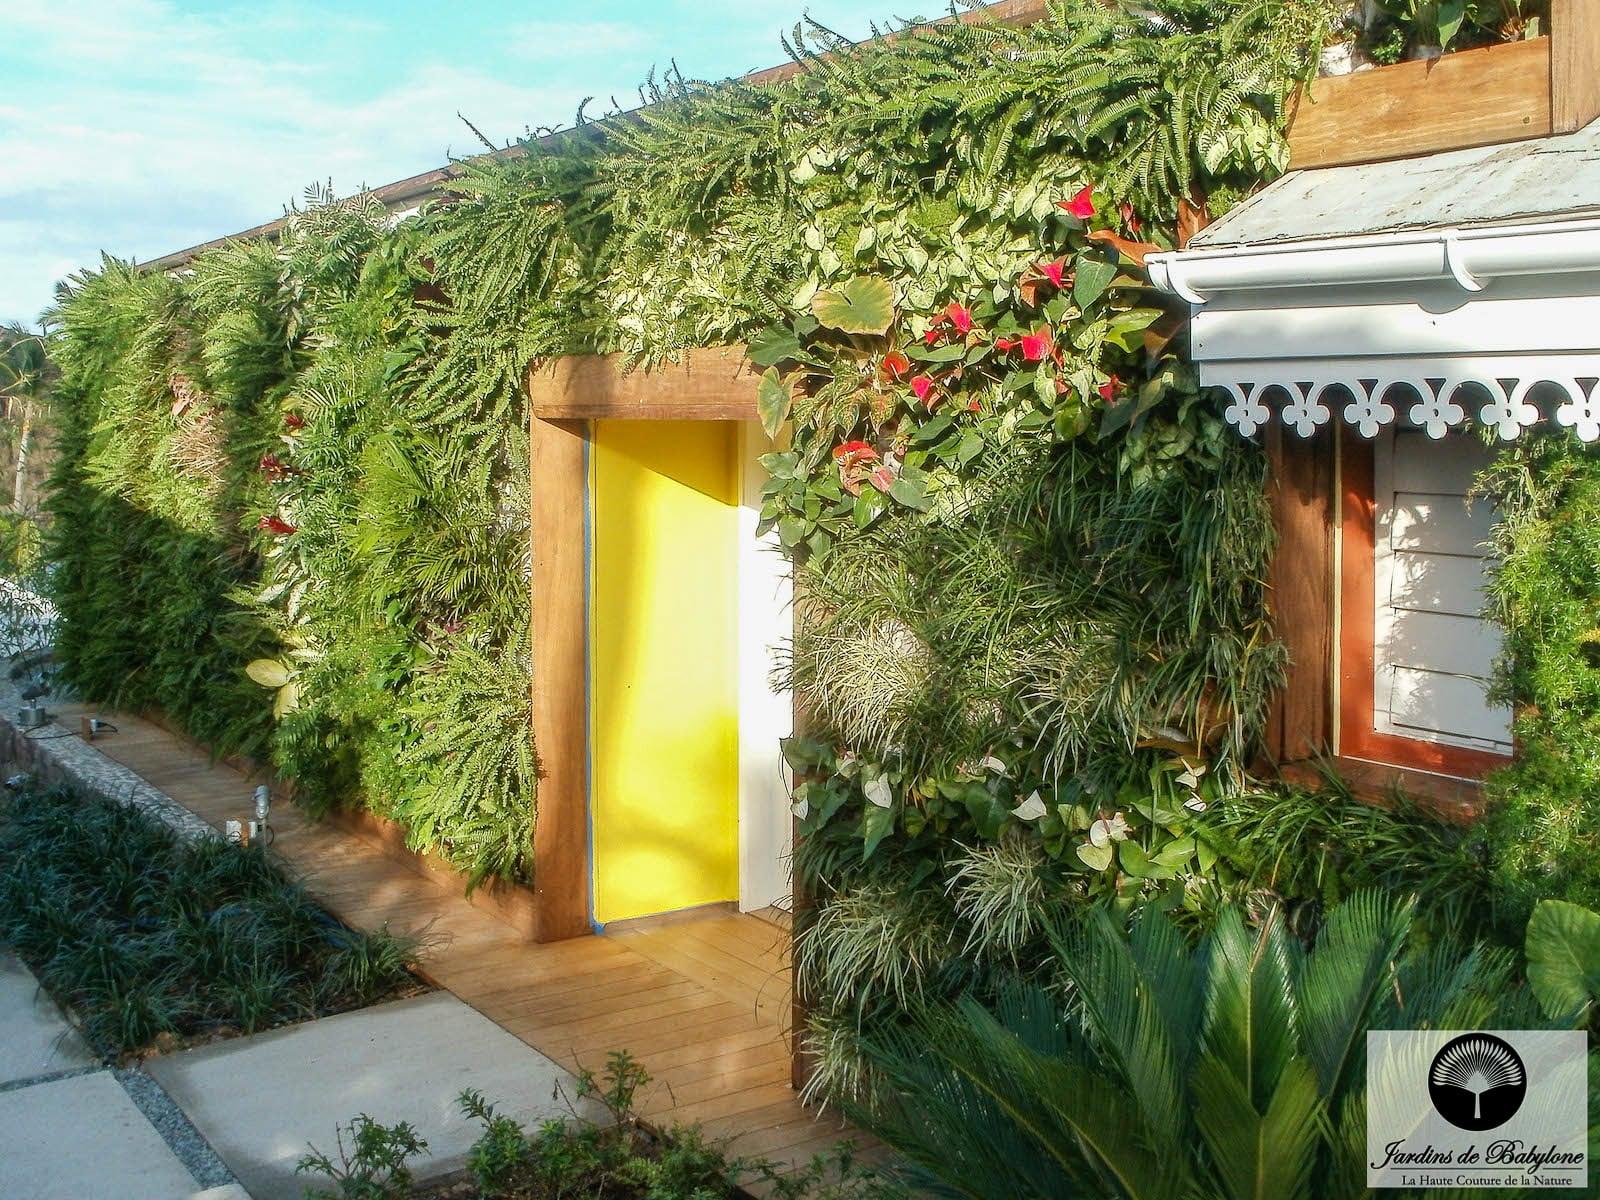 Facade Vegetale Nouvelle Technologie Alliant Mur Vegetal